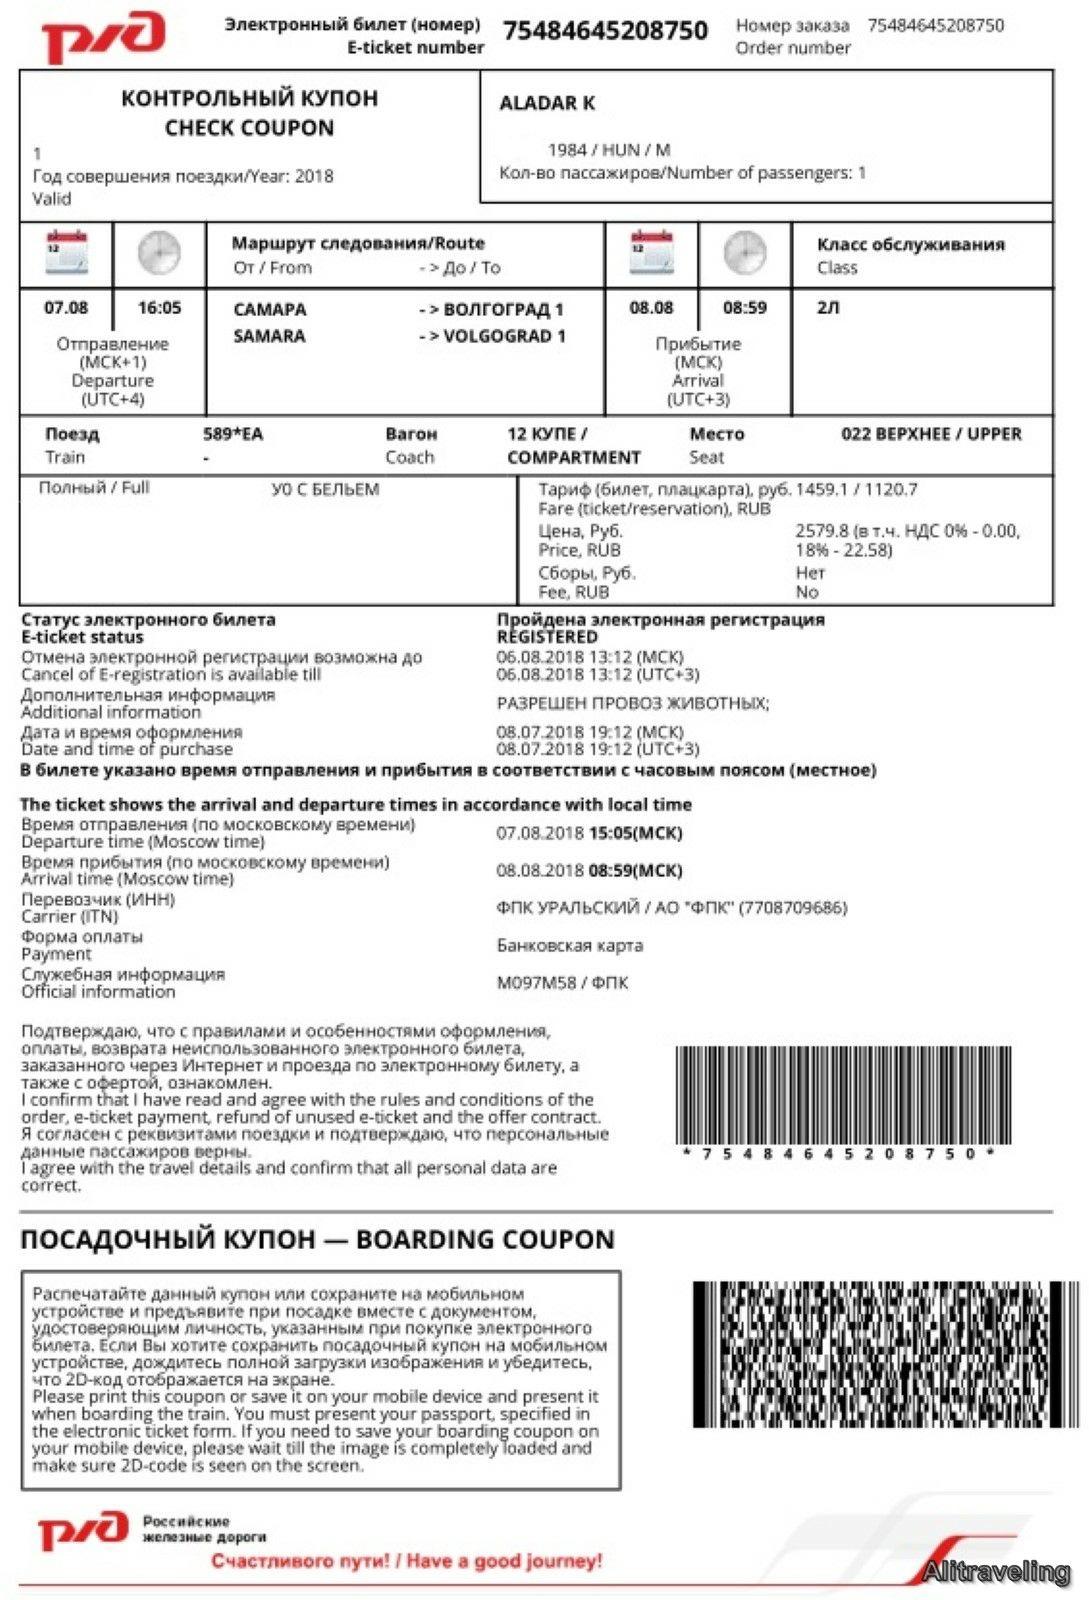 e_ticket_1.jpg